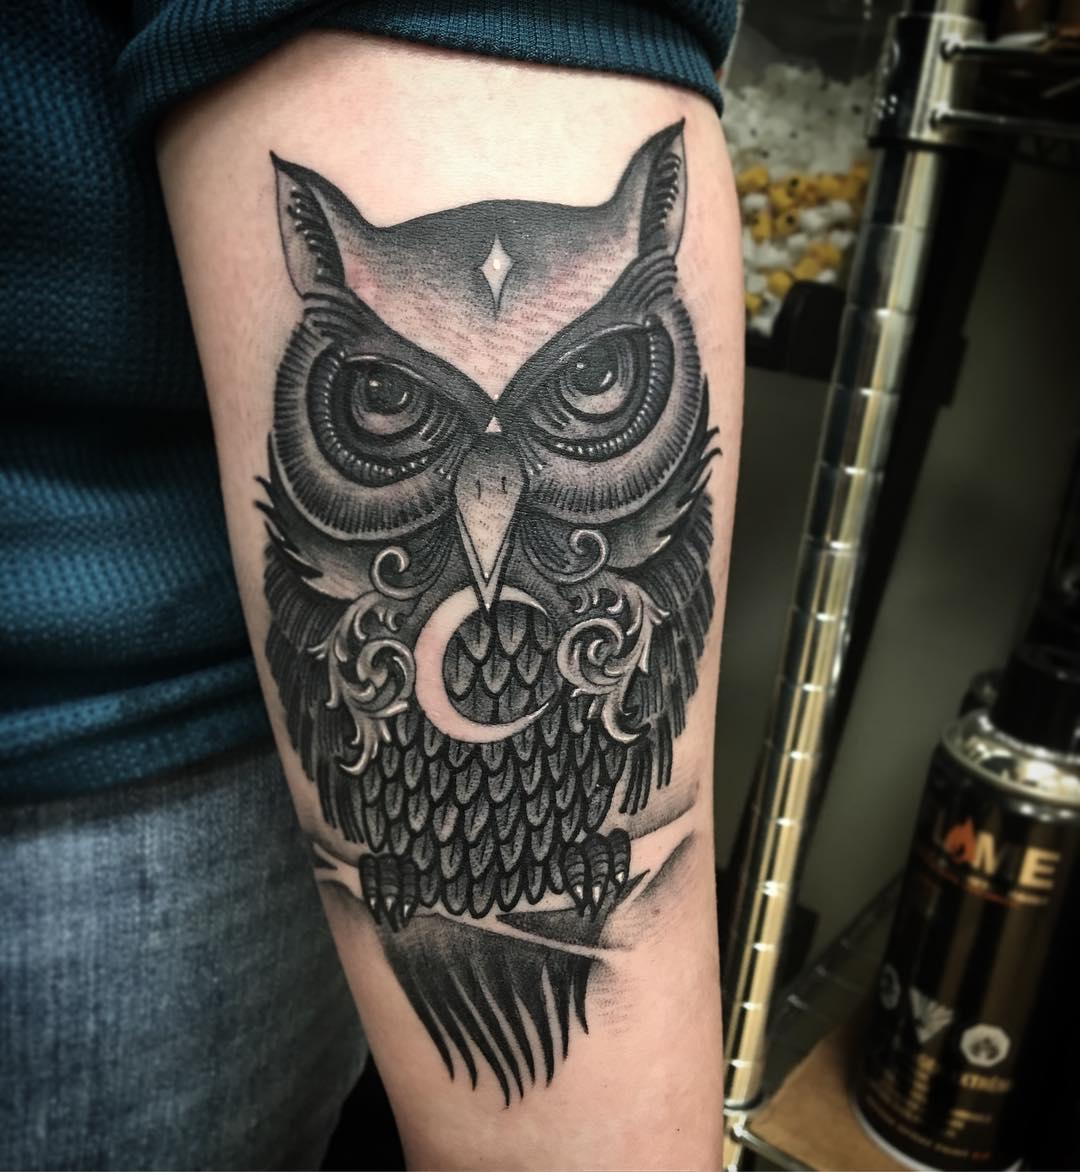 Trendy Black Coverup Forearm Owl Tattoo Blurmark